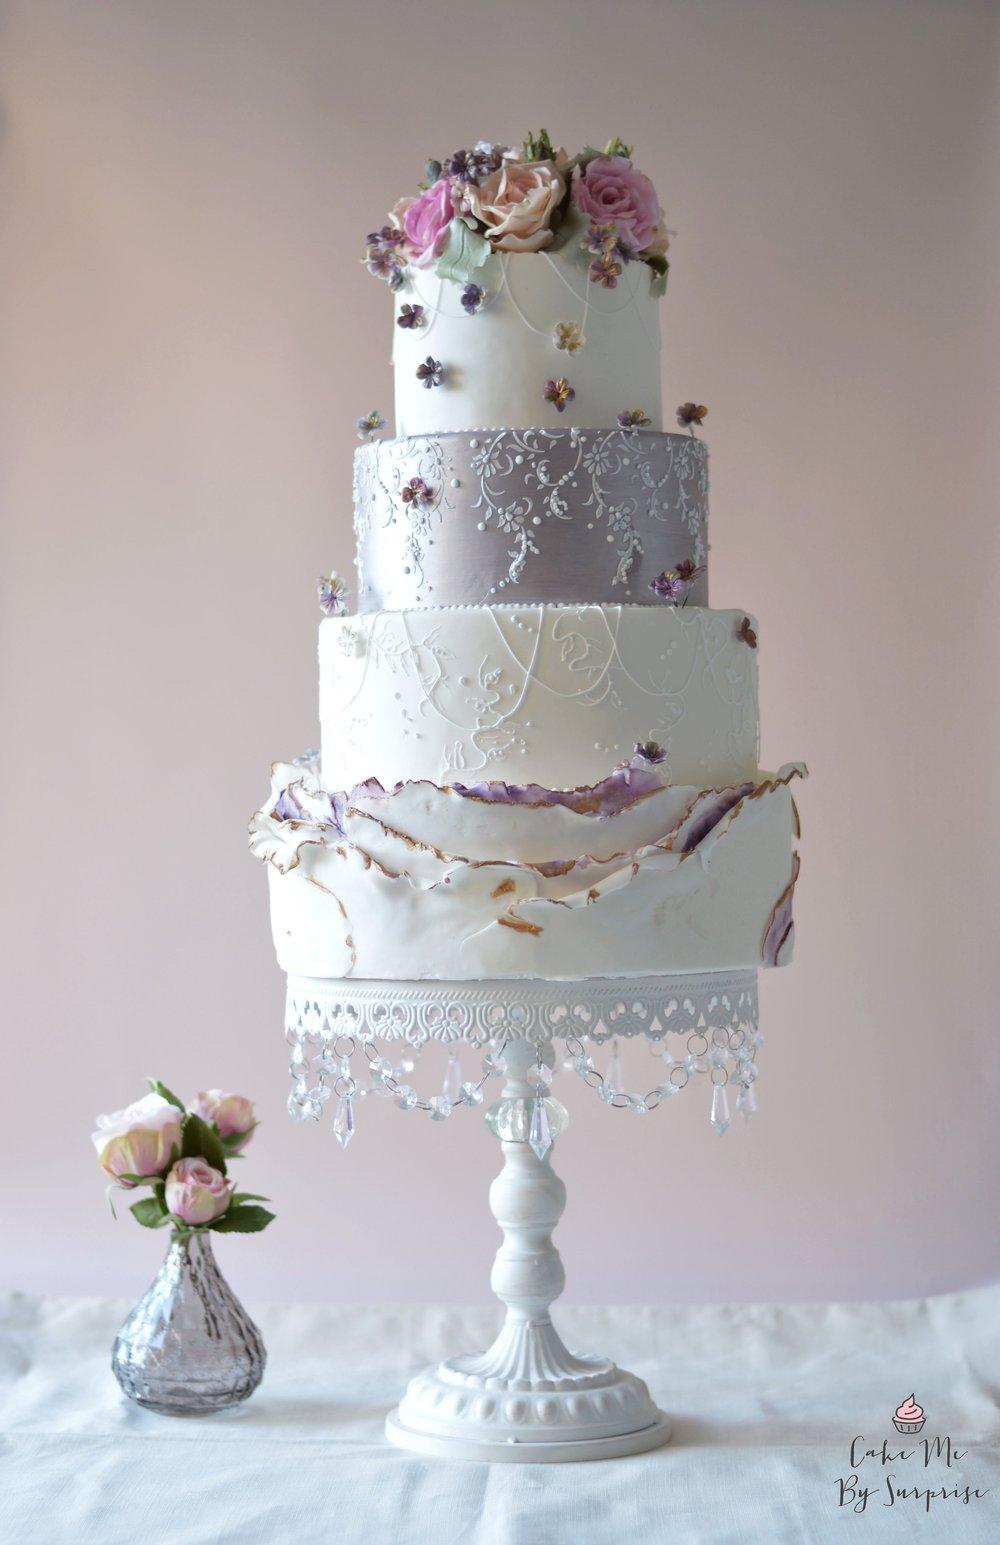 Meredith - Purple Luster Wedding Cake Serves 190-200 £750